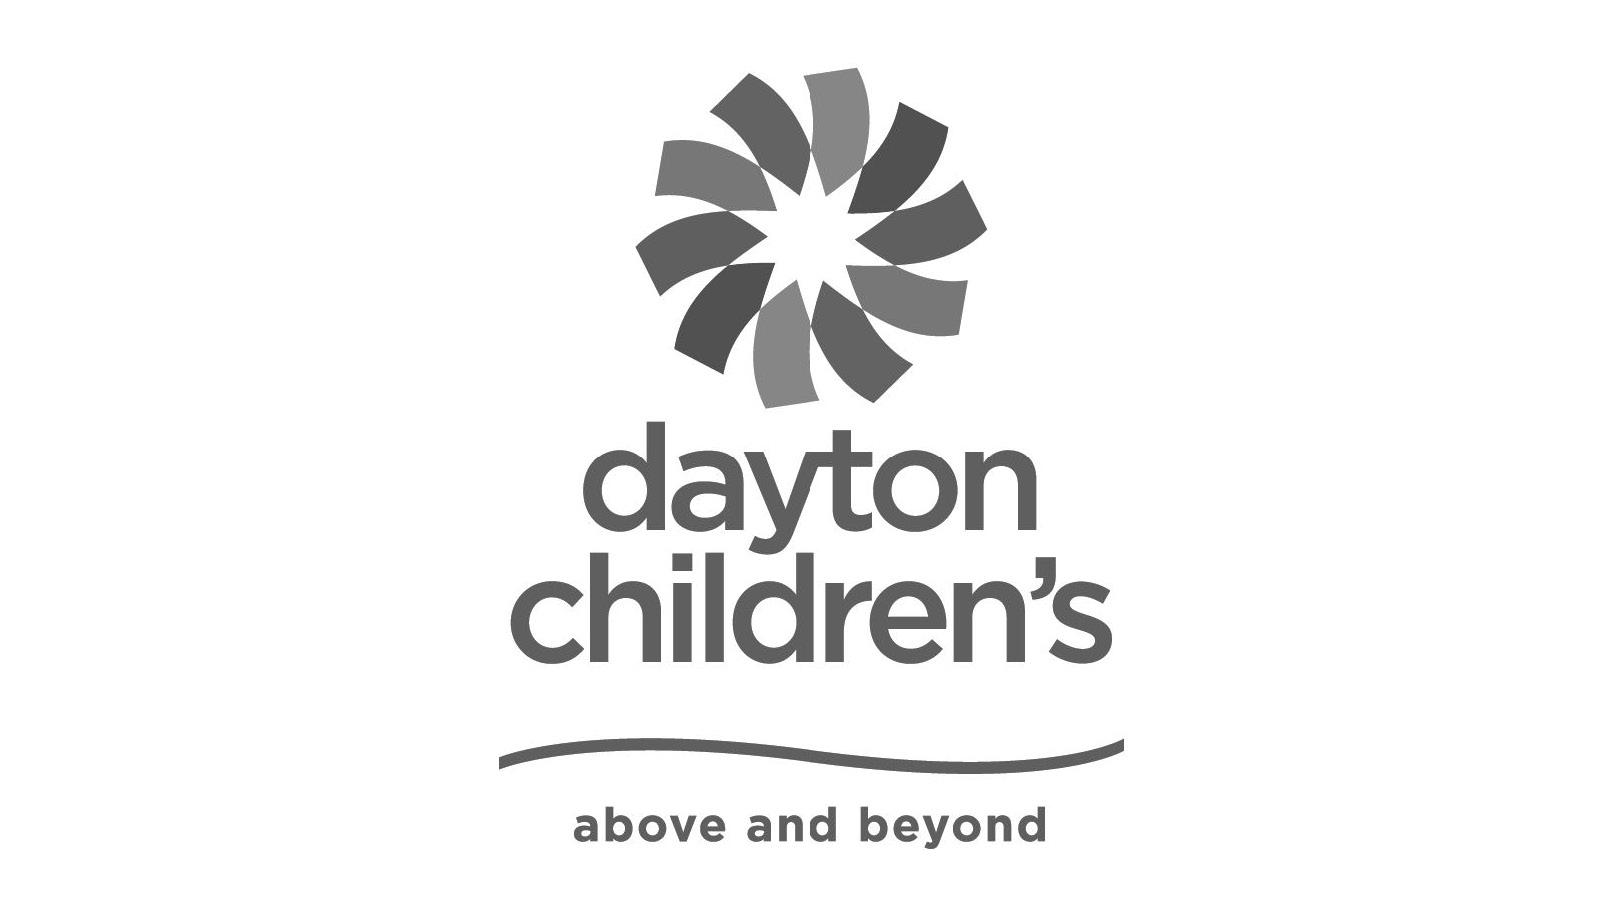 Dayton Children's - above and beyond - logo